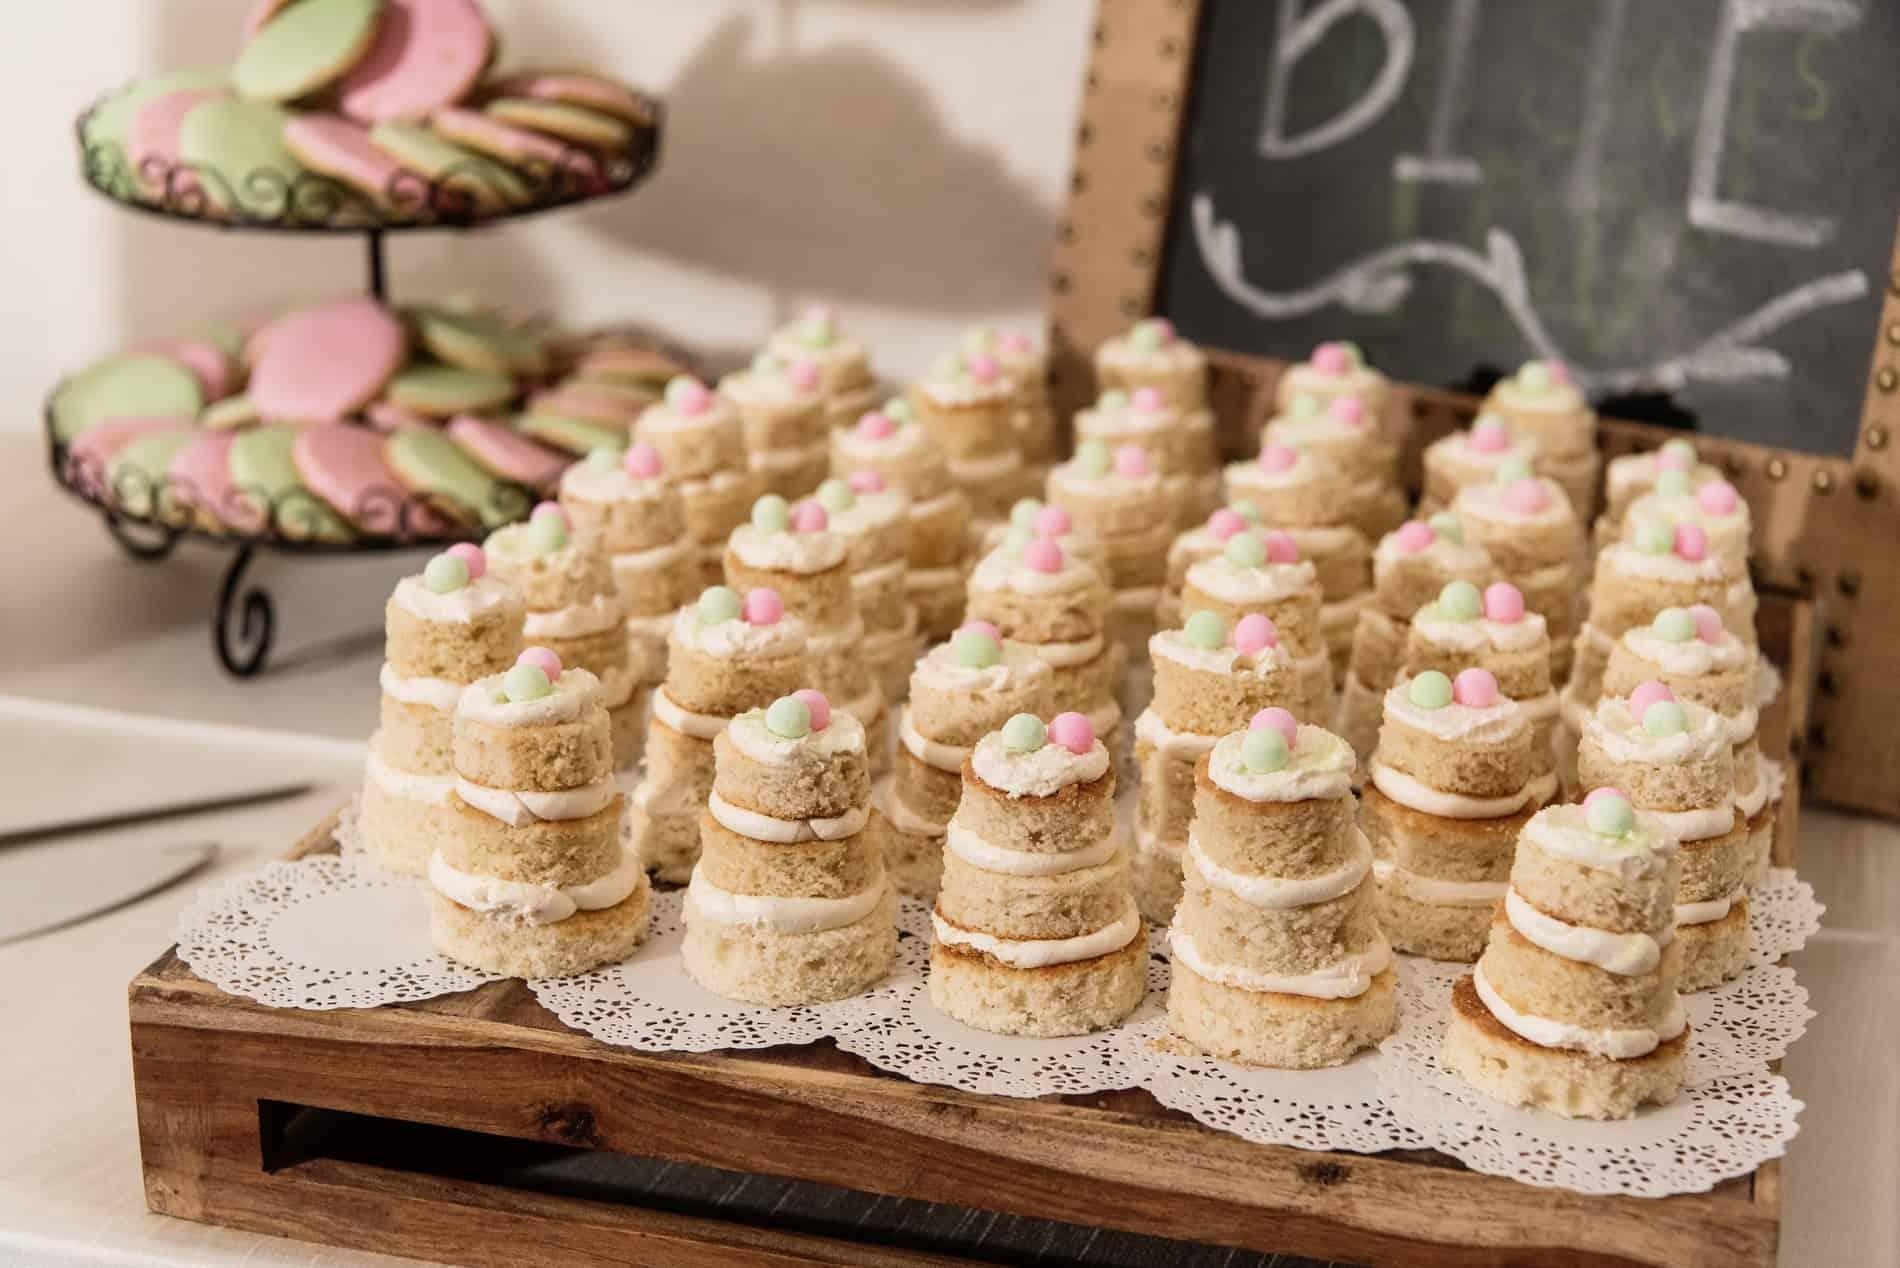 Rustic Dessert Station but at an elegant Wedding Reception